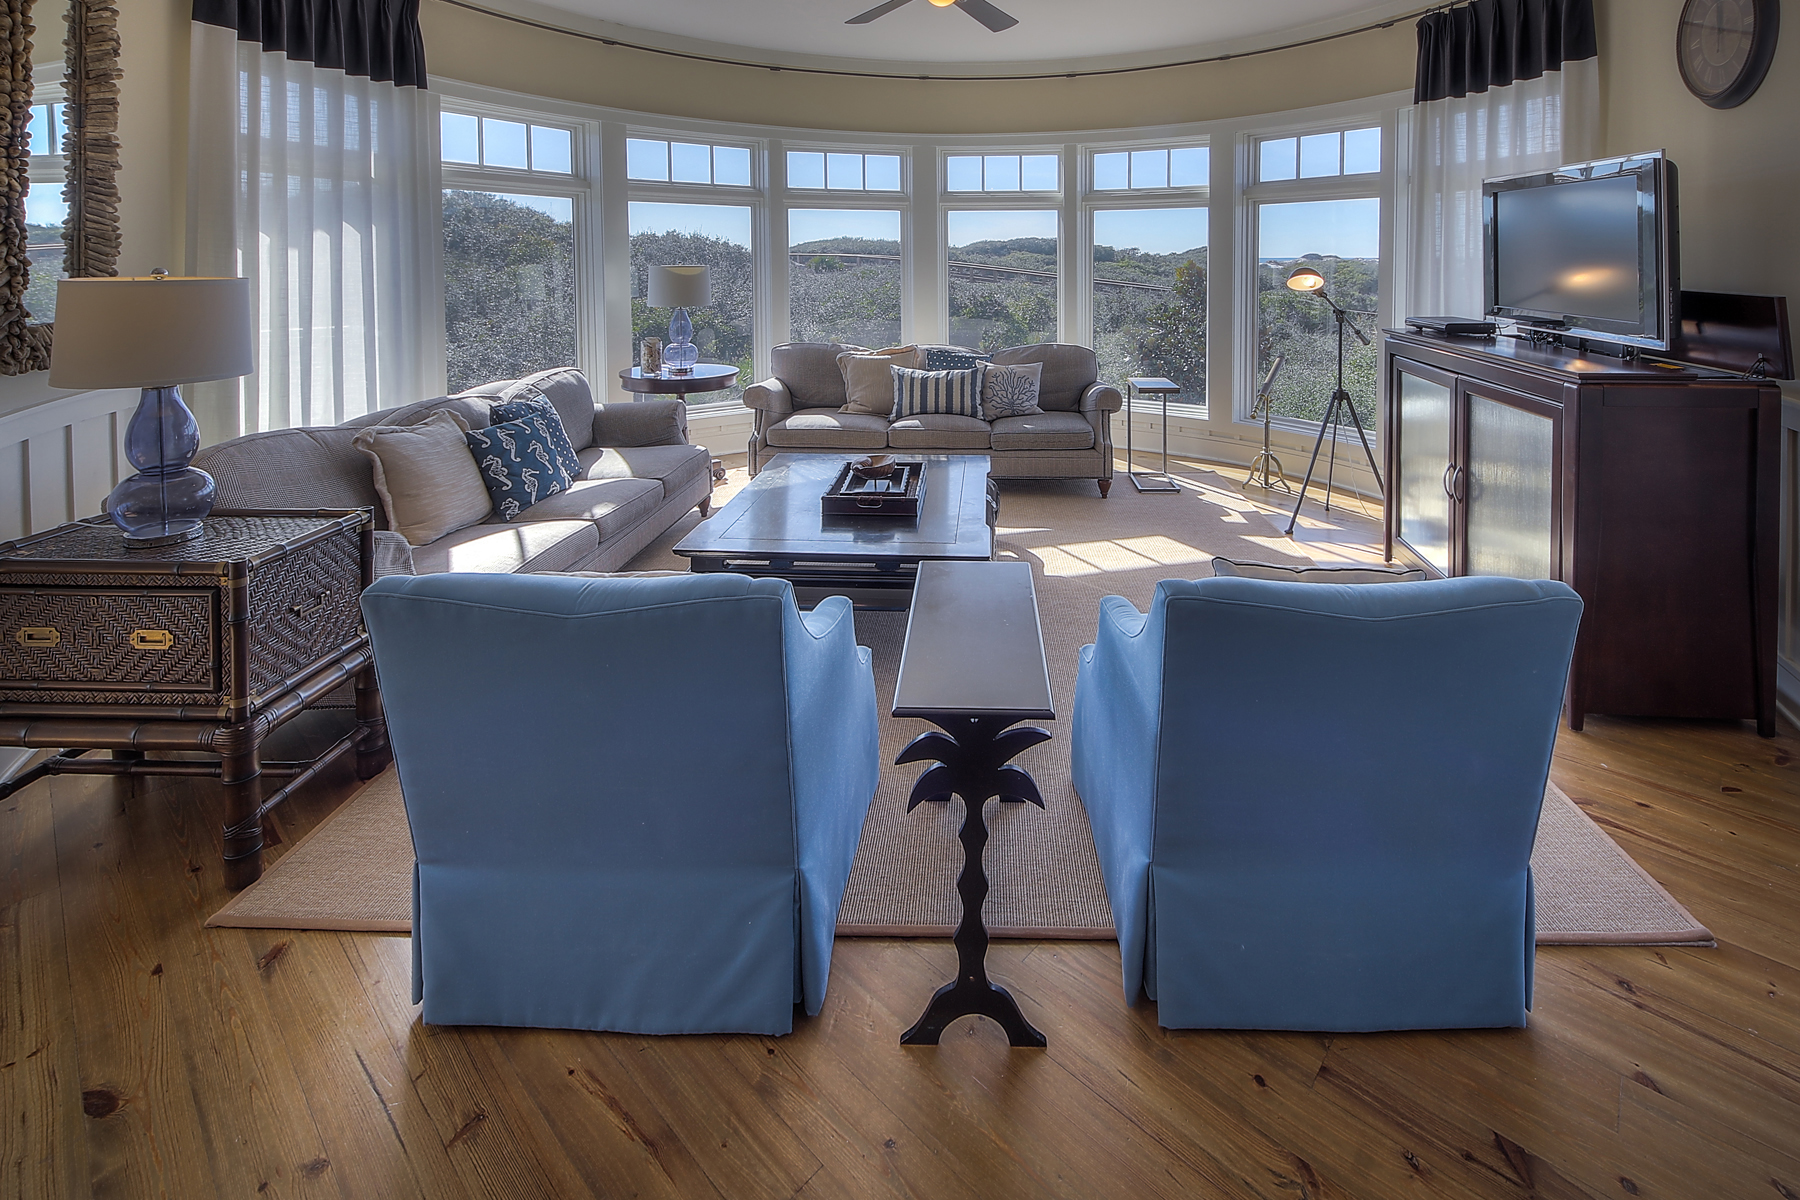 共管式独立产权公寓 为 销售 在 RESORT STYLE LIVING AT EXCLUSIVE COMPASS POINT IN WATERSOUND 99 Compass Point Way 208 Watersound, 佛罗里达州, 32461 美国